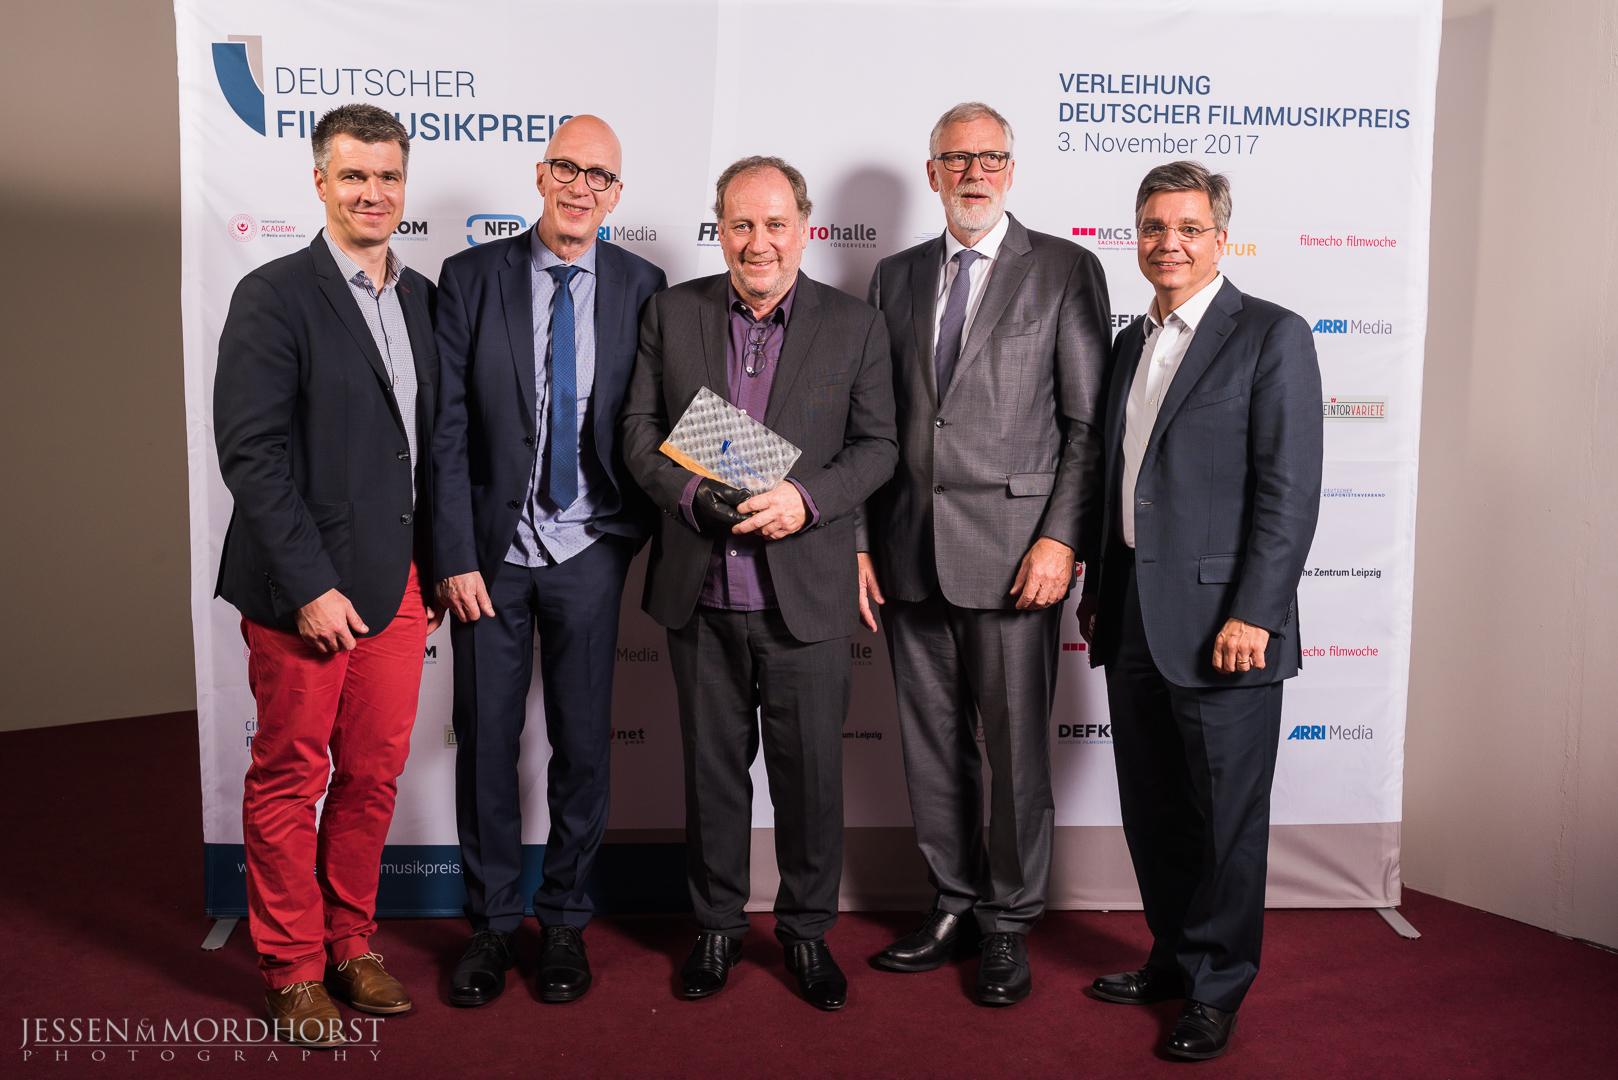 v.l.n.r. Mike Riemenschneider, Micki Meuser, Harold Faltermeyer, Rainer Robra, Alexander Thies